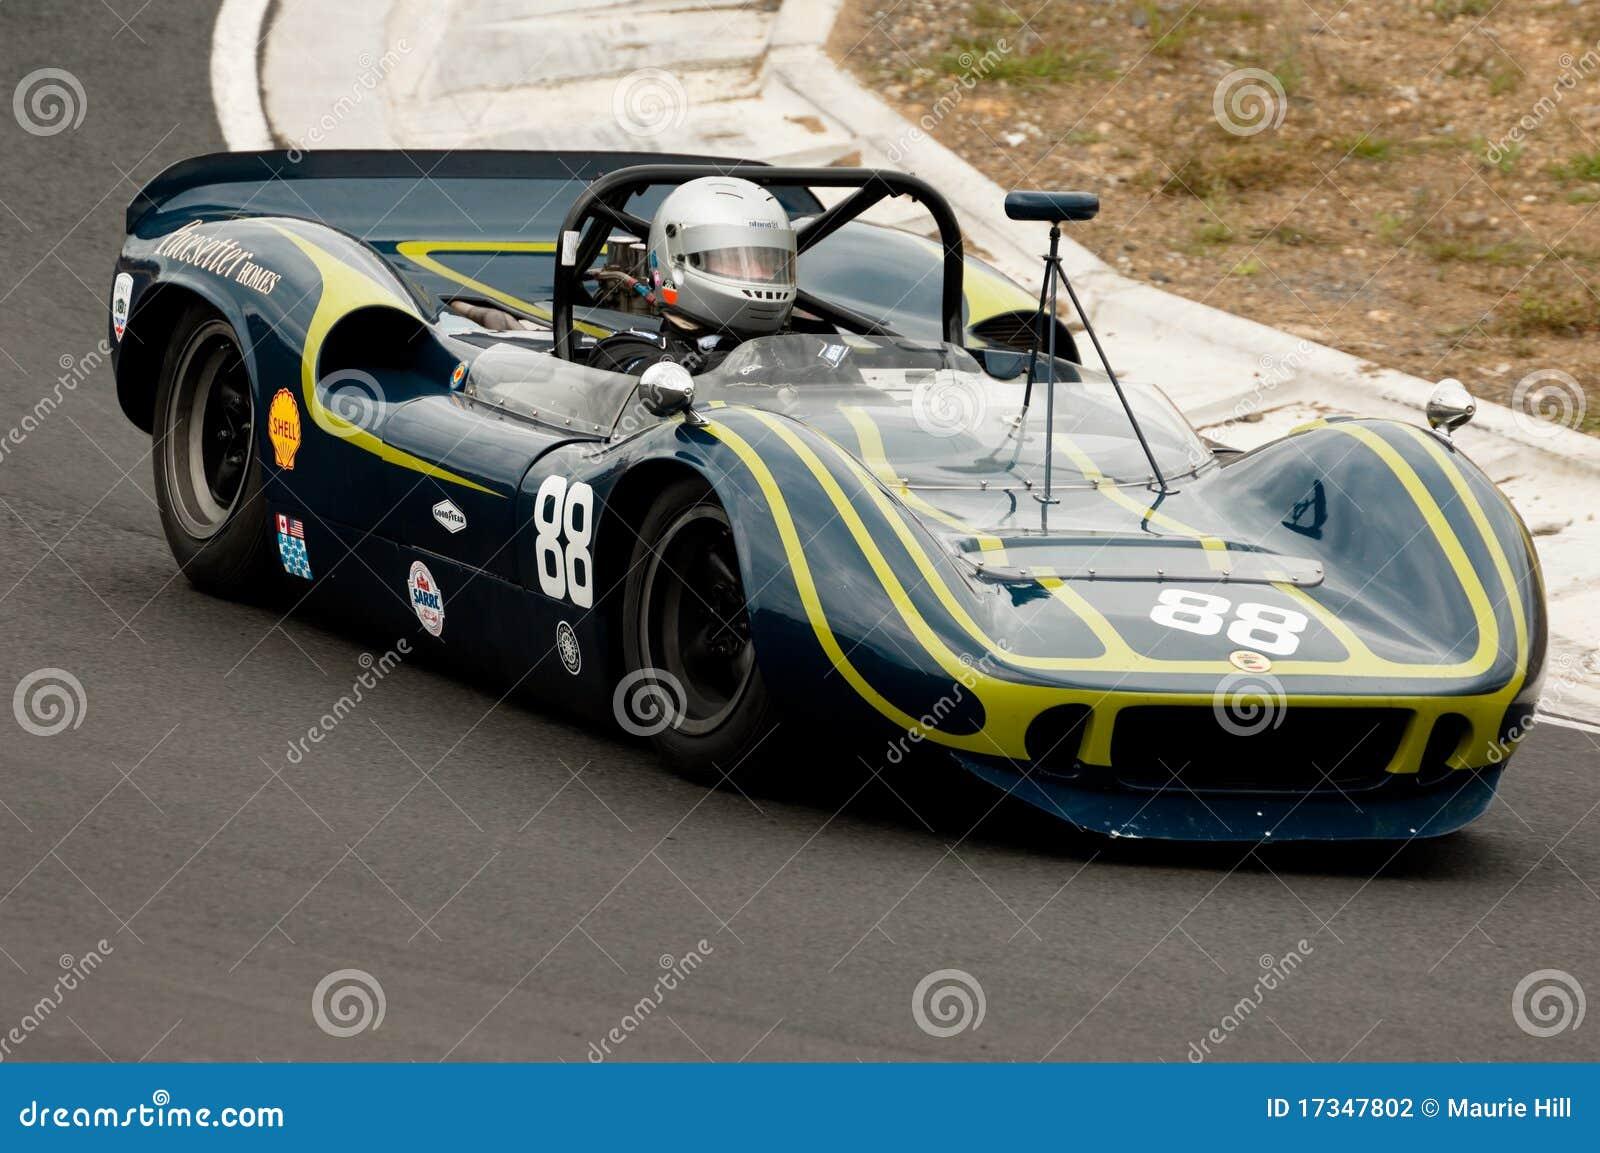 Mclaren Can Am Racing Car At Speed Editorial Photography Image Of